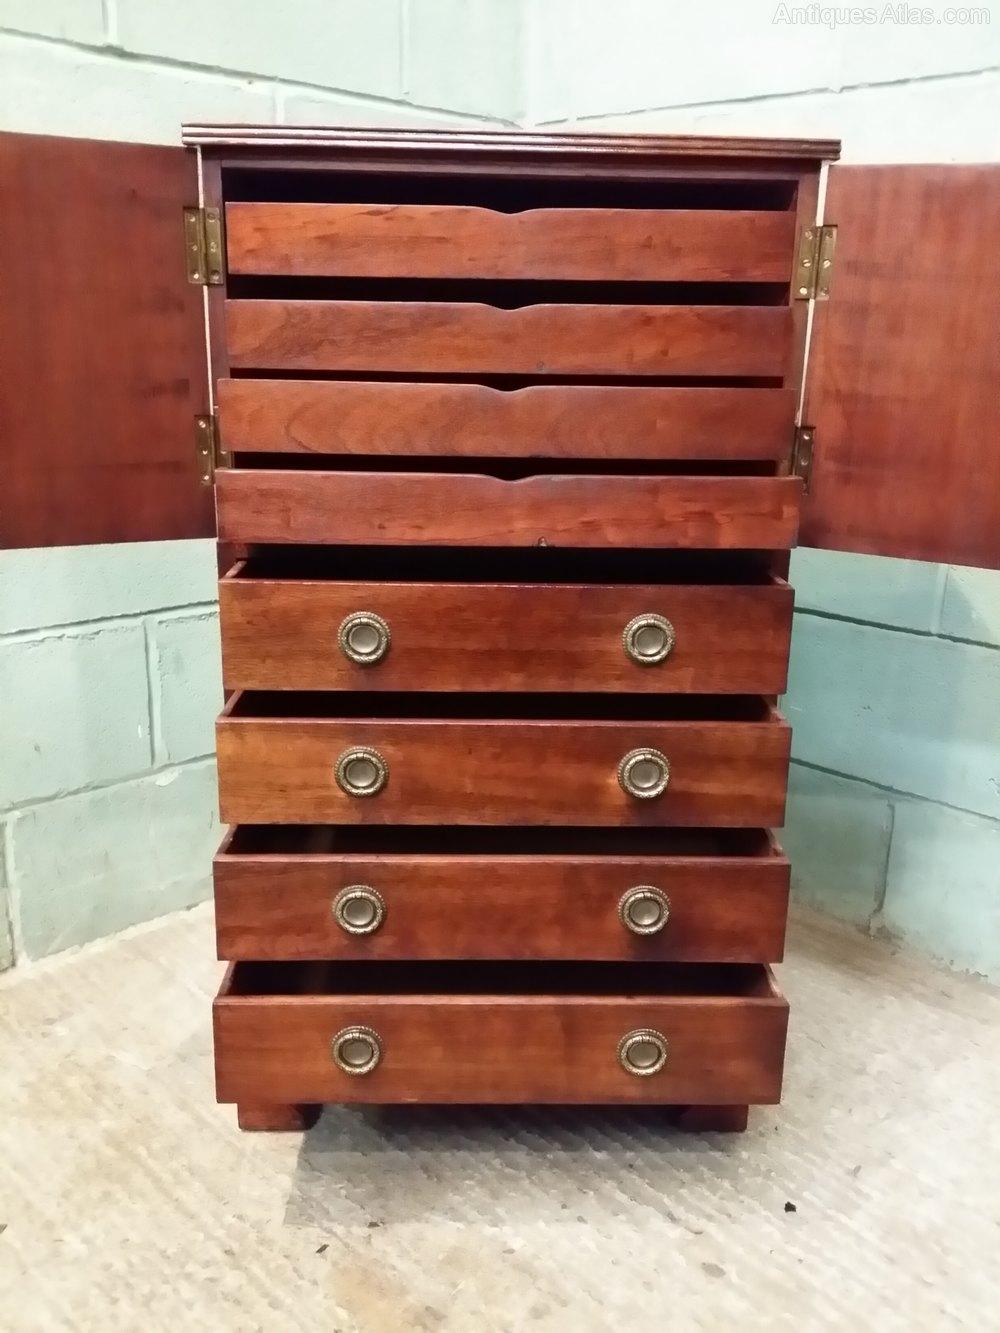 edwardian mahogany tallboy chest of drawers c1900. Black Bedroom Furniture Sets. Home Design Ideas